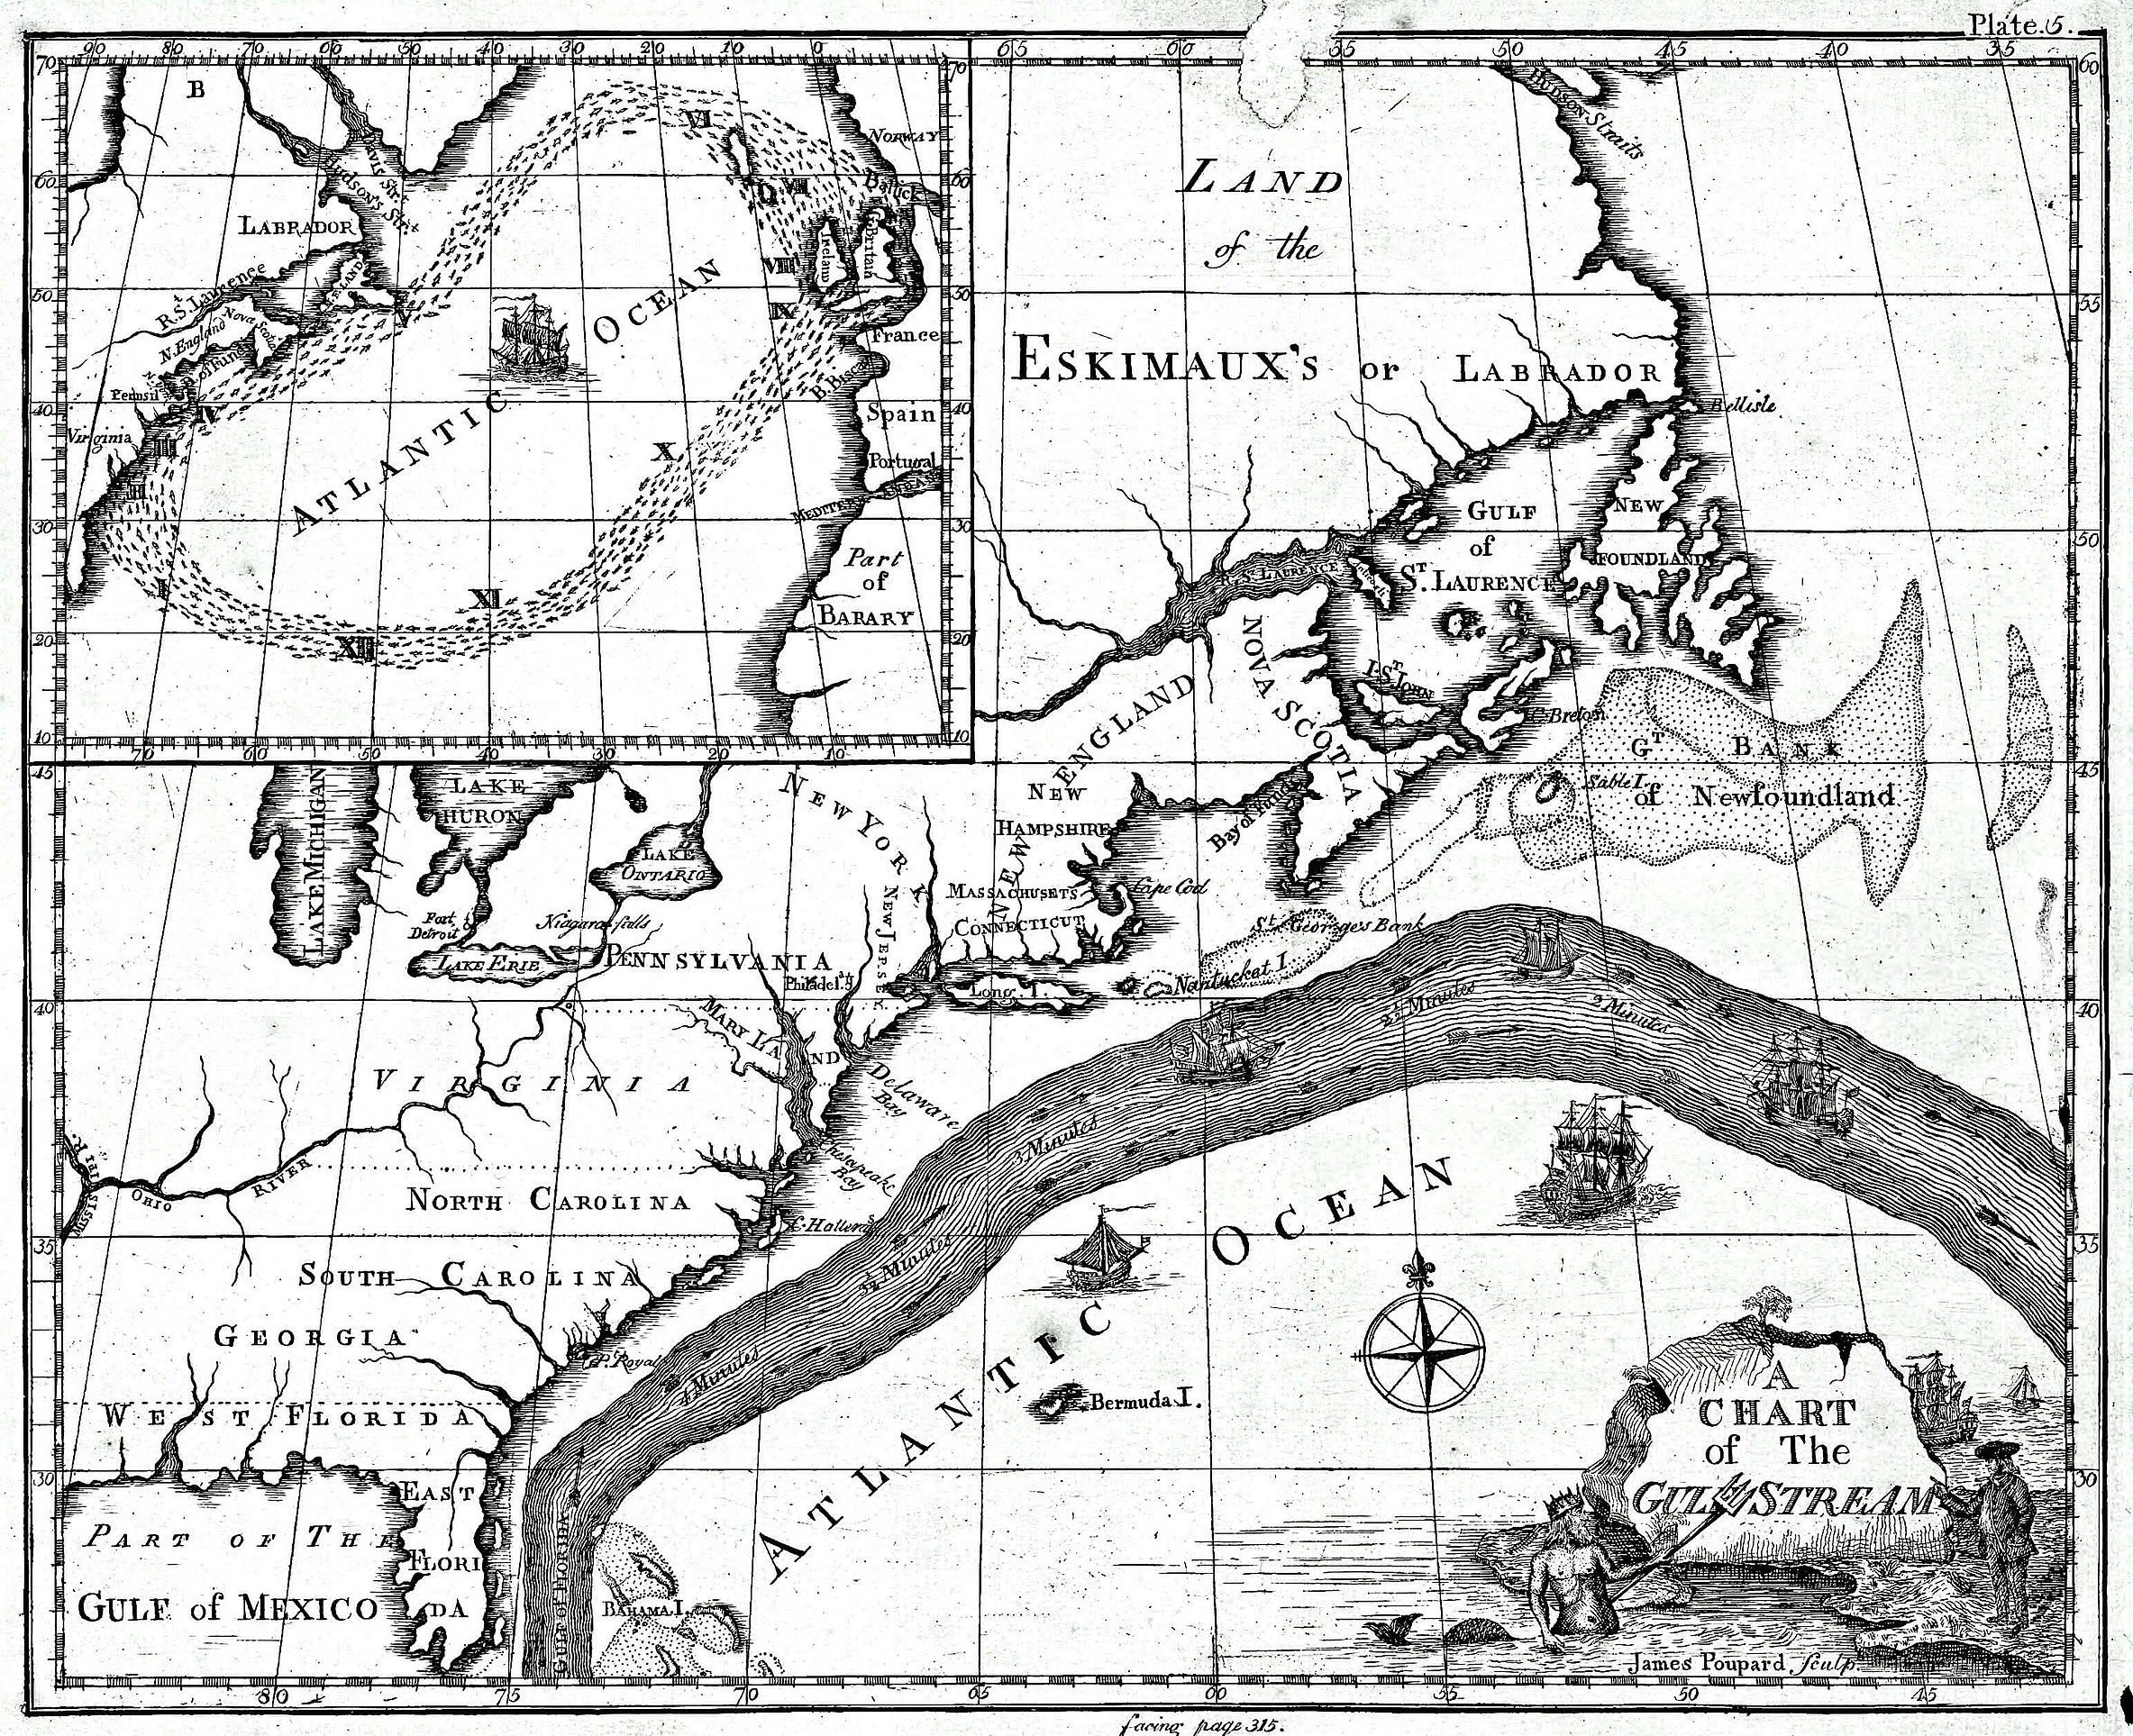 Benjamin Franklin's map of the Gulf Stream